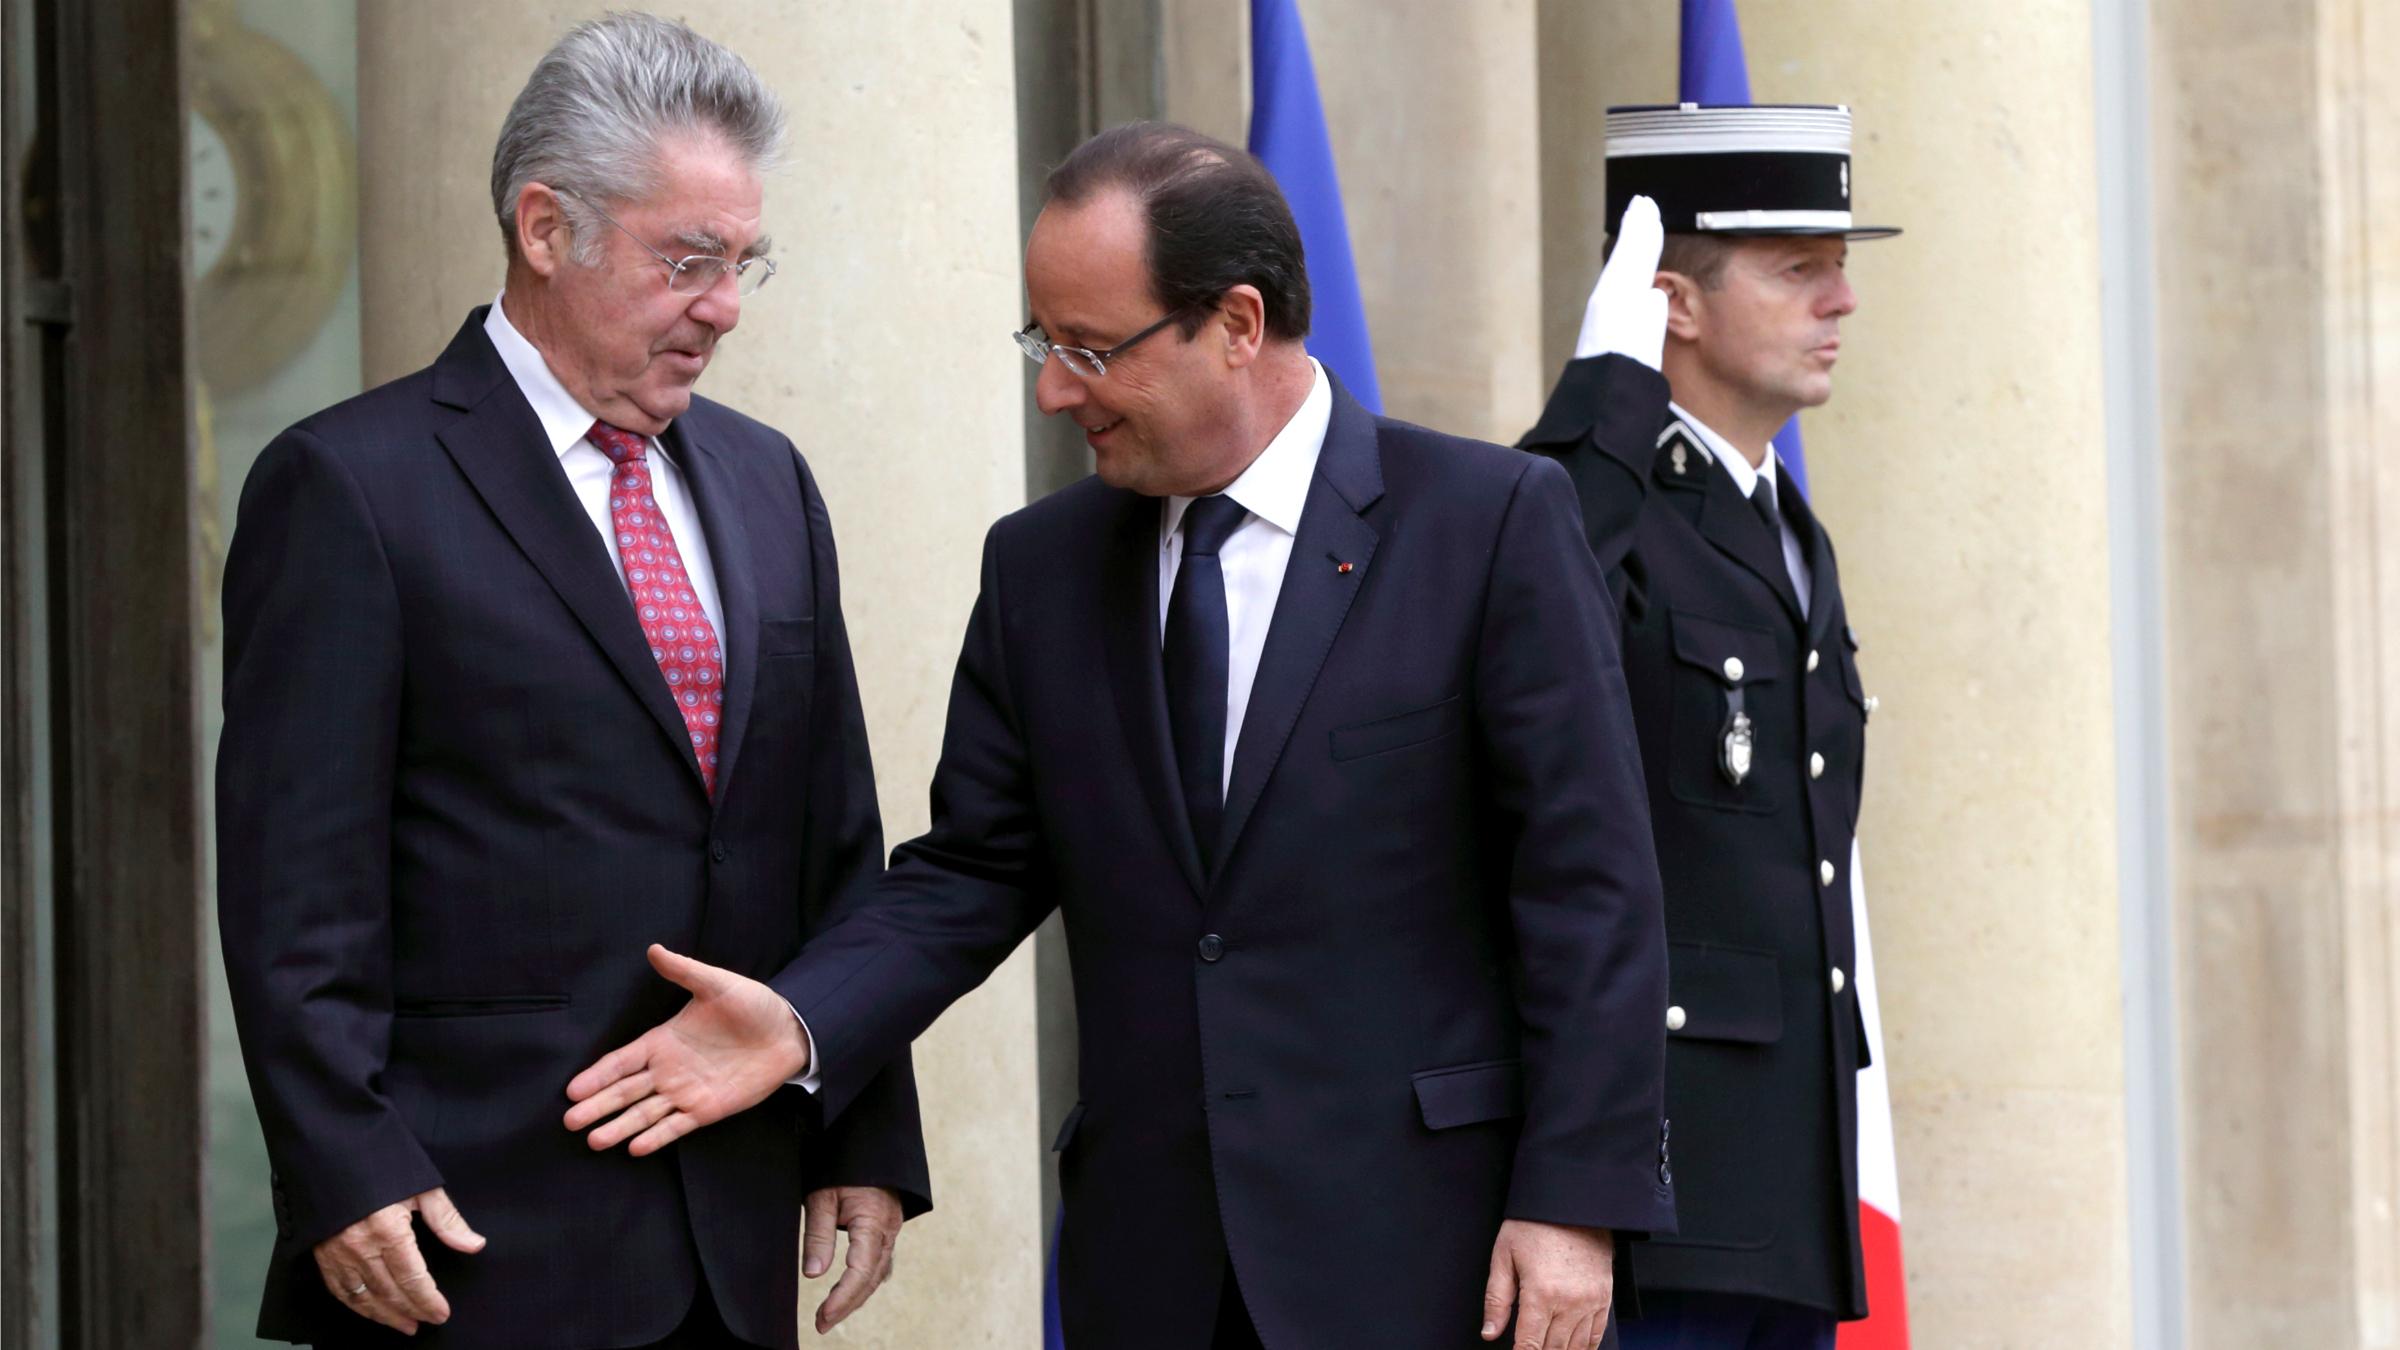 Francois Hollande failed handhake